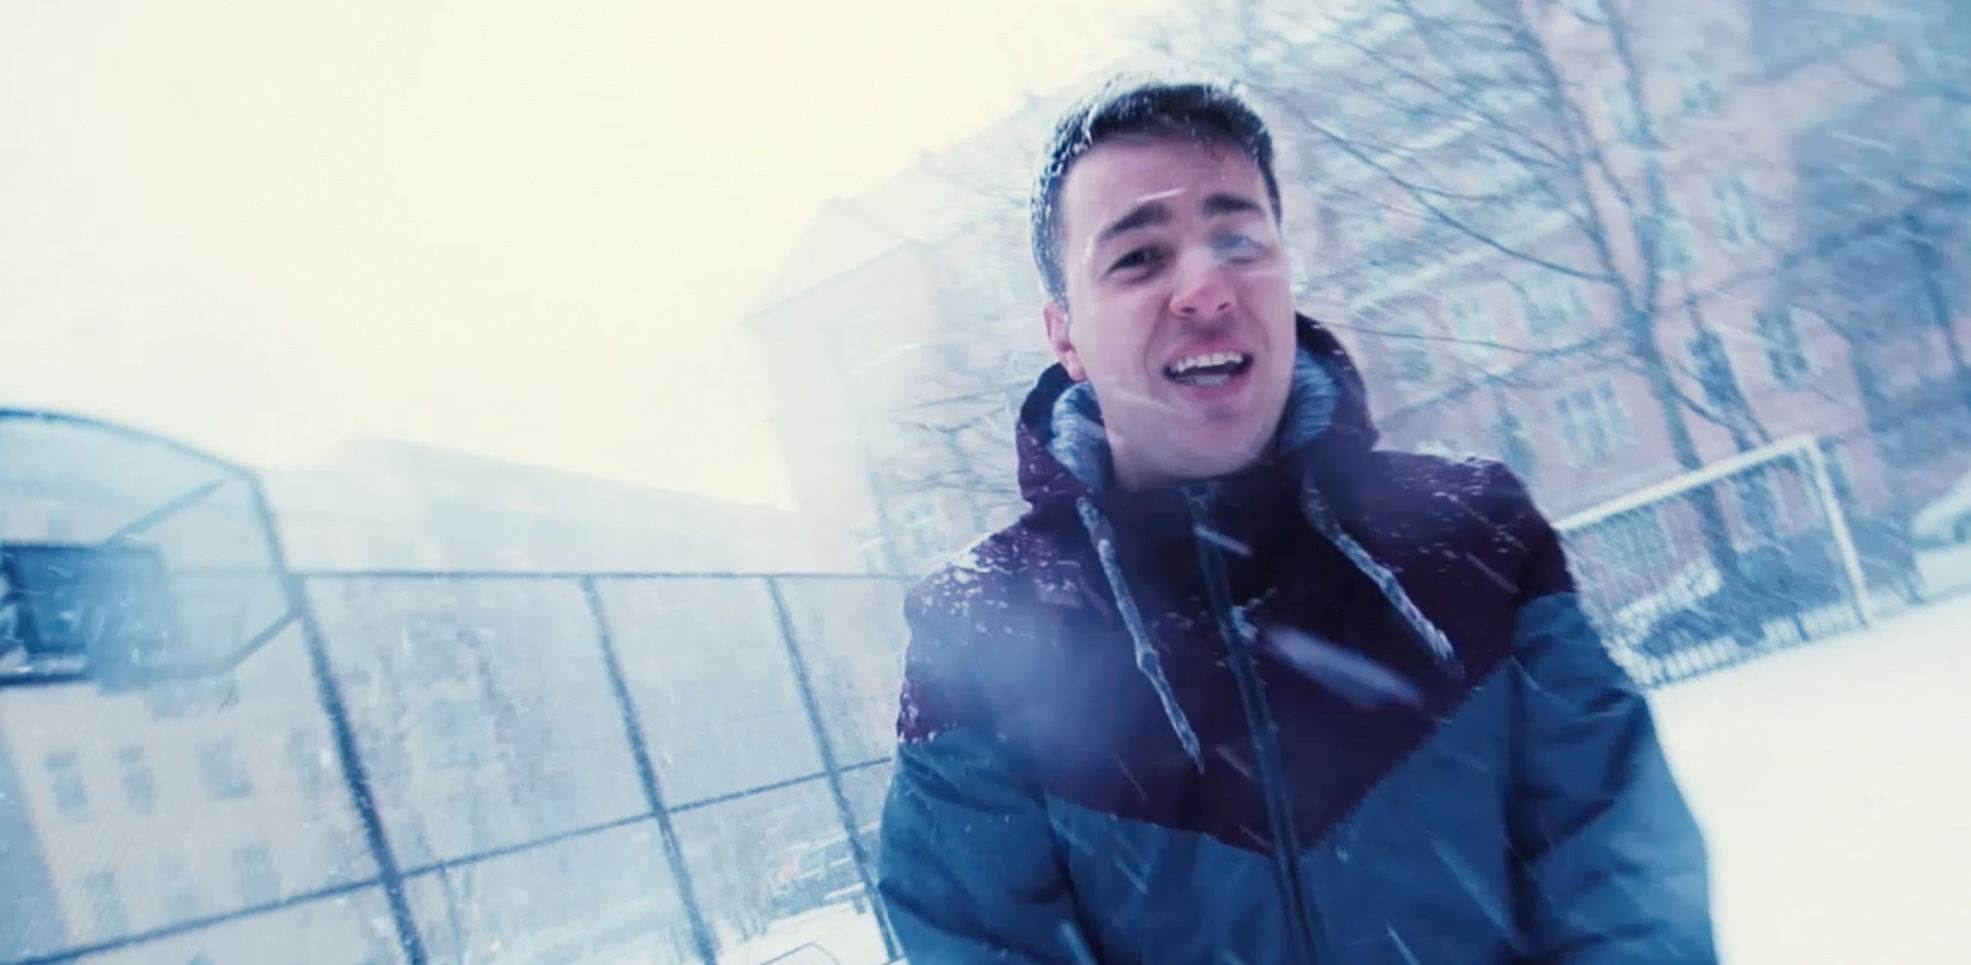 Pimf - SchneeBars (Video) // 16BARS.DE